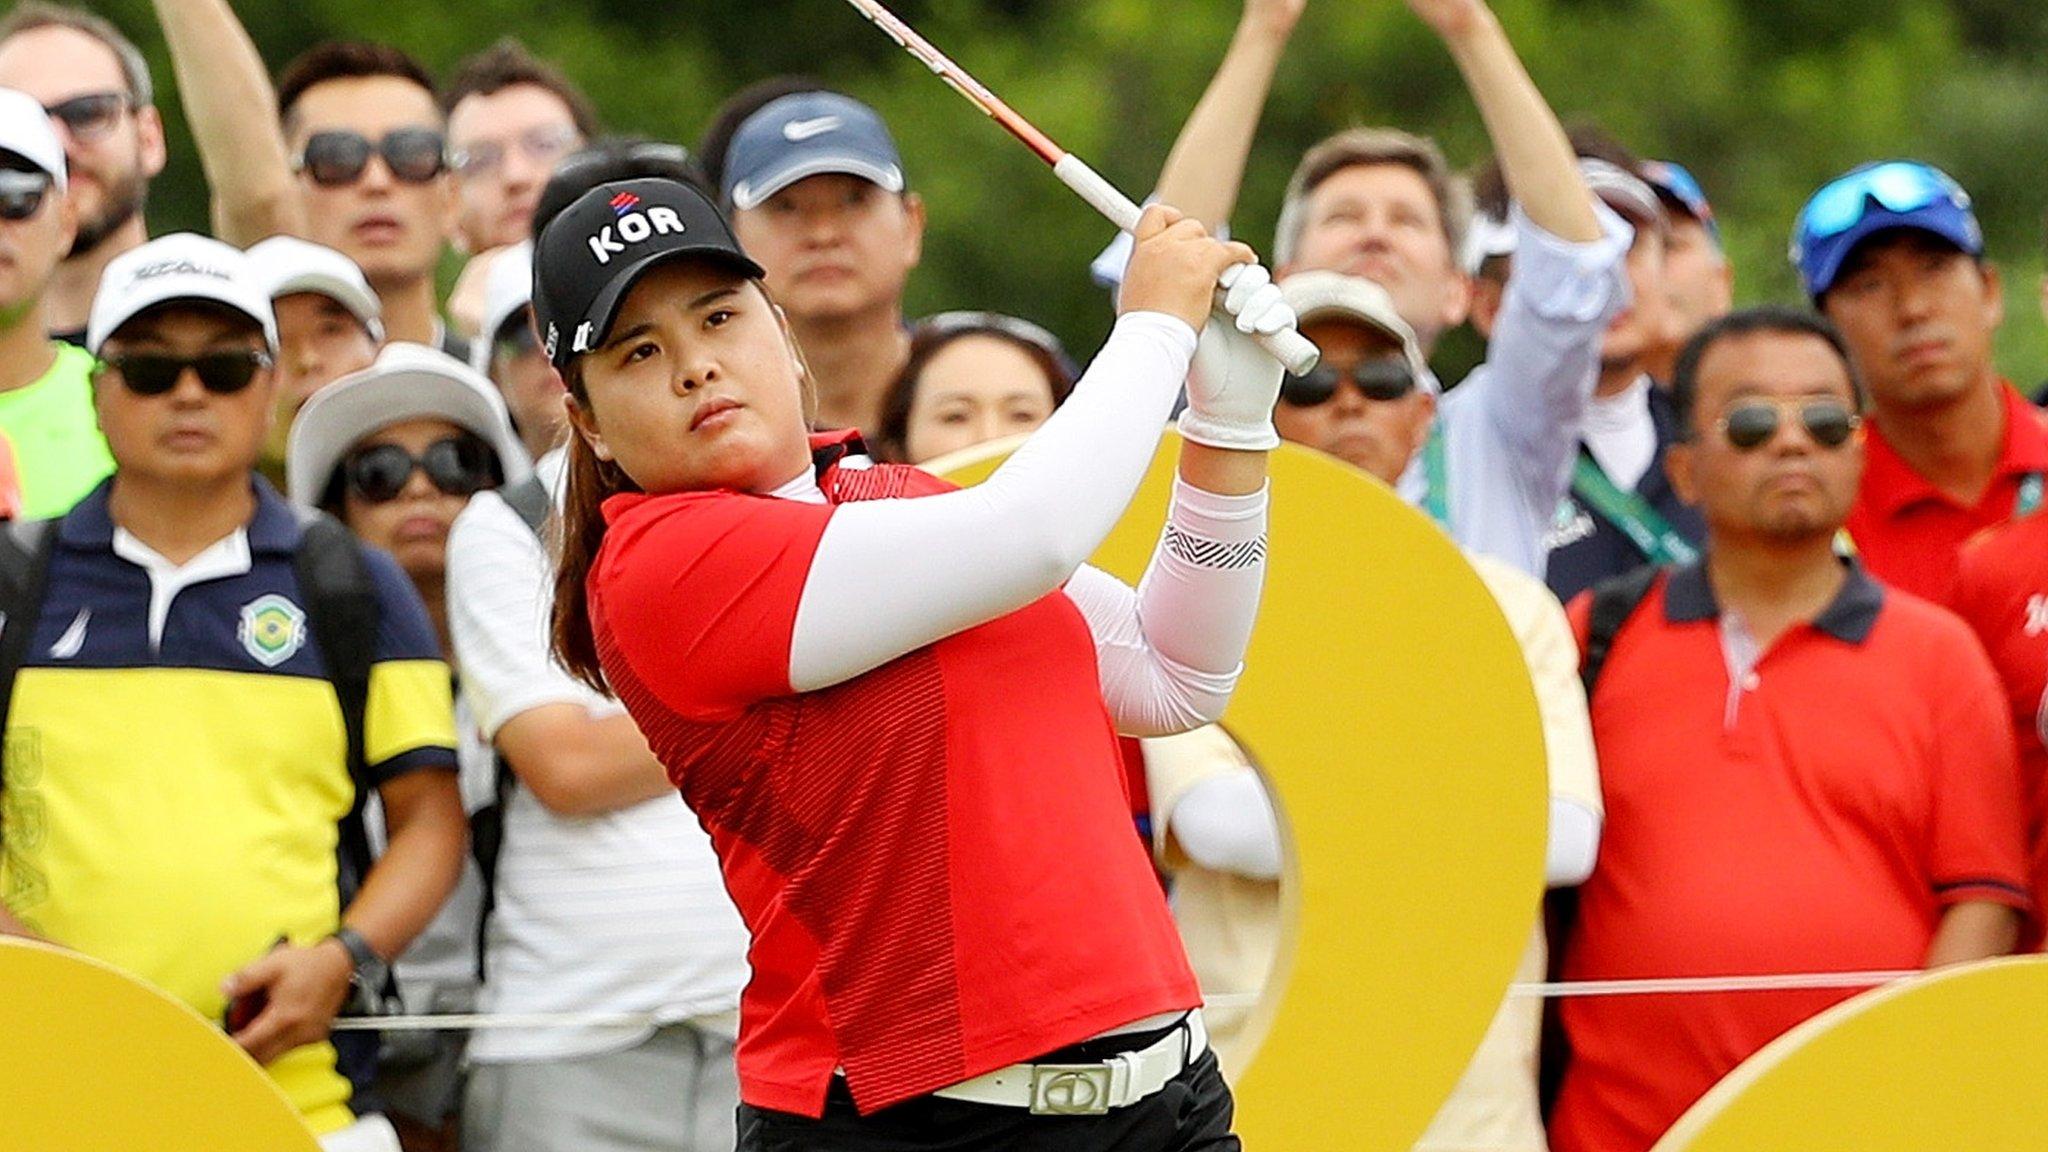 South Korea's Park wins Olympic golf gold